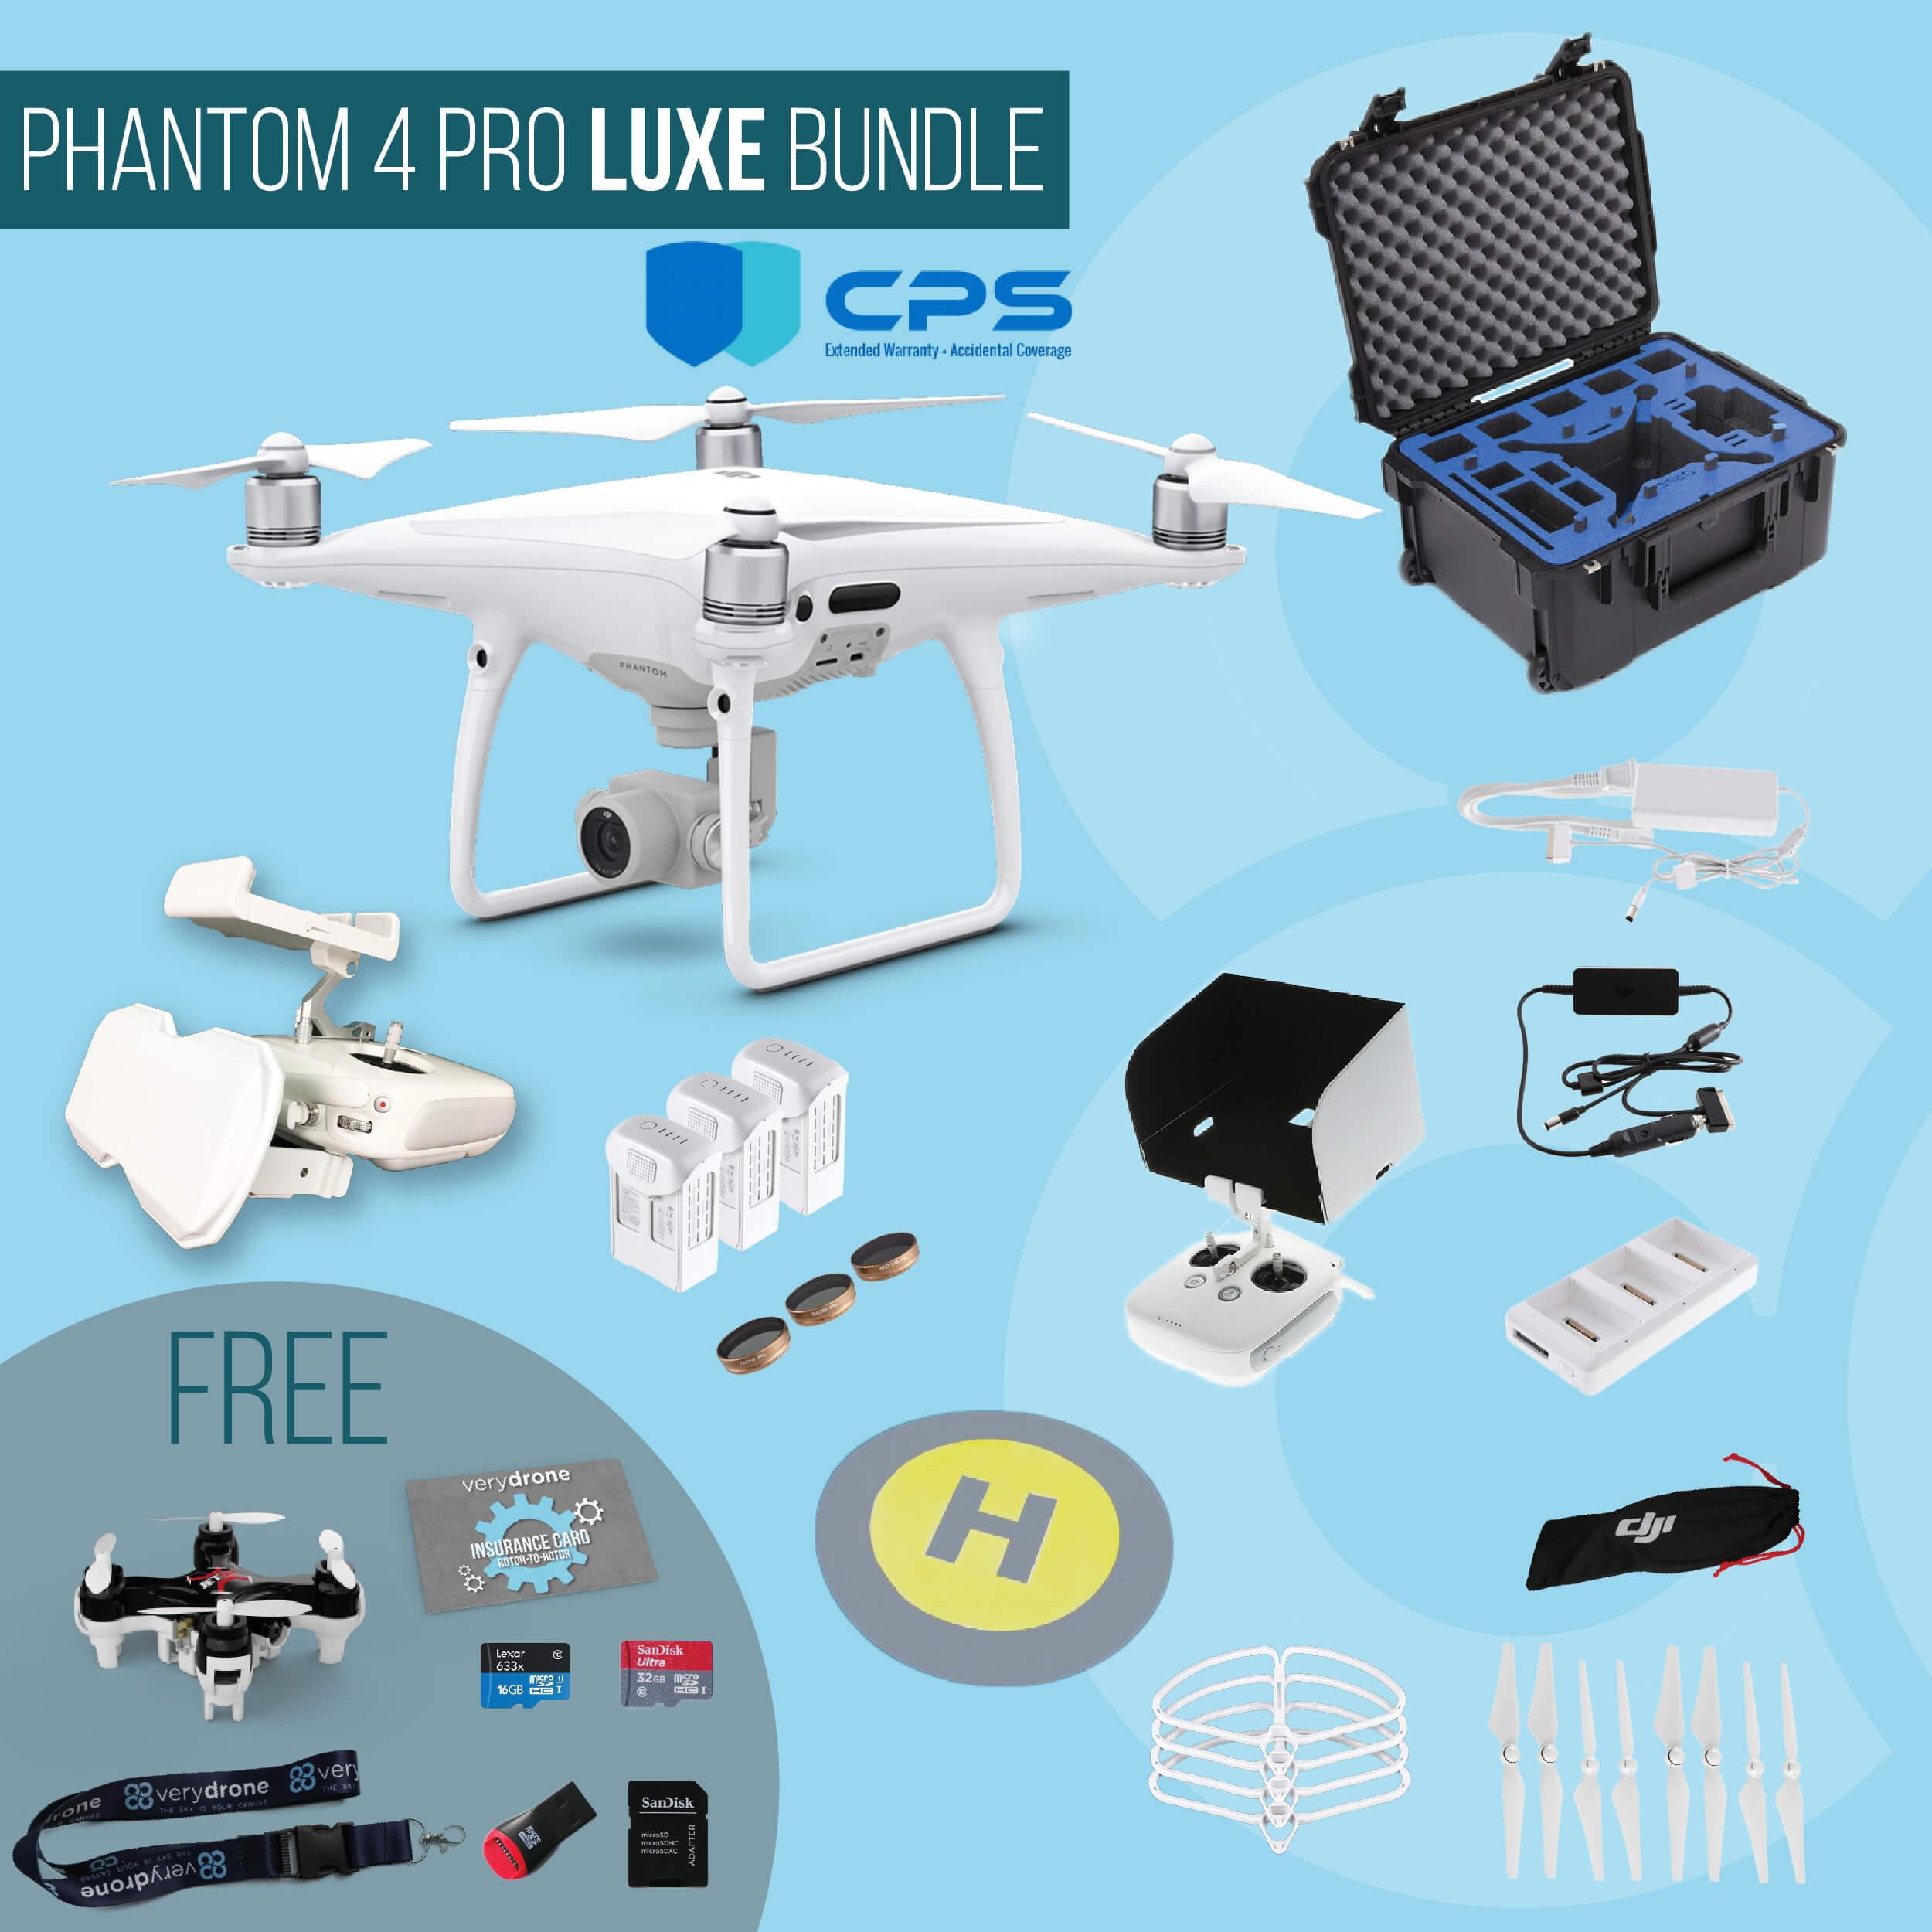 DJI Phantom 4 Pro - Luxe Bundle insured